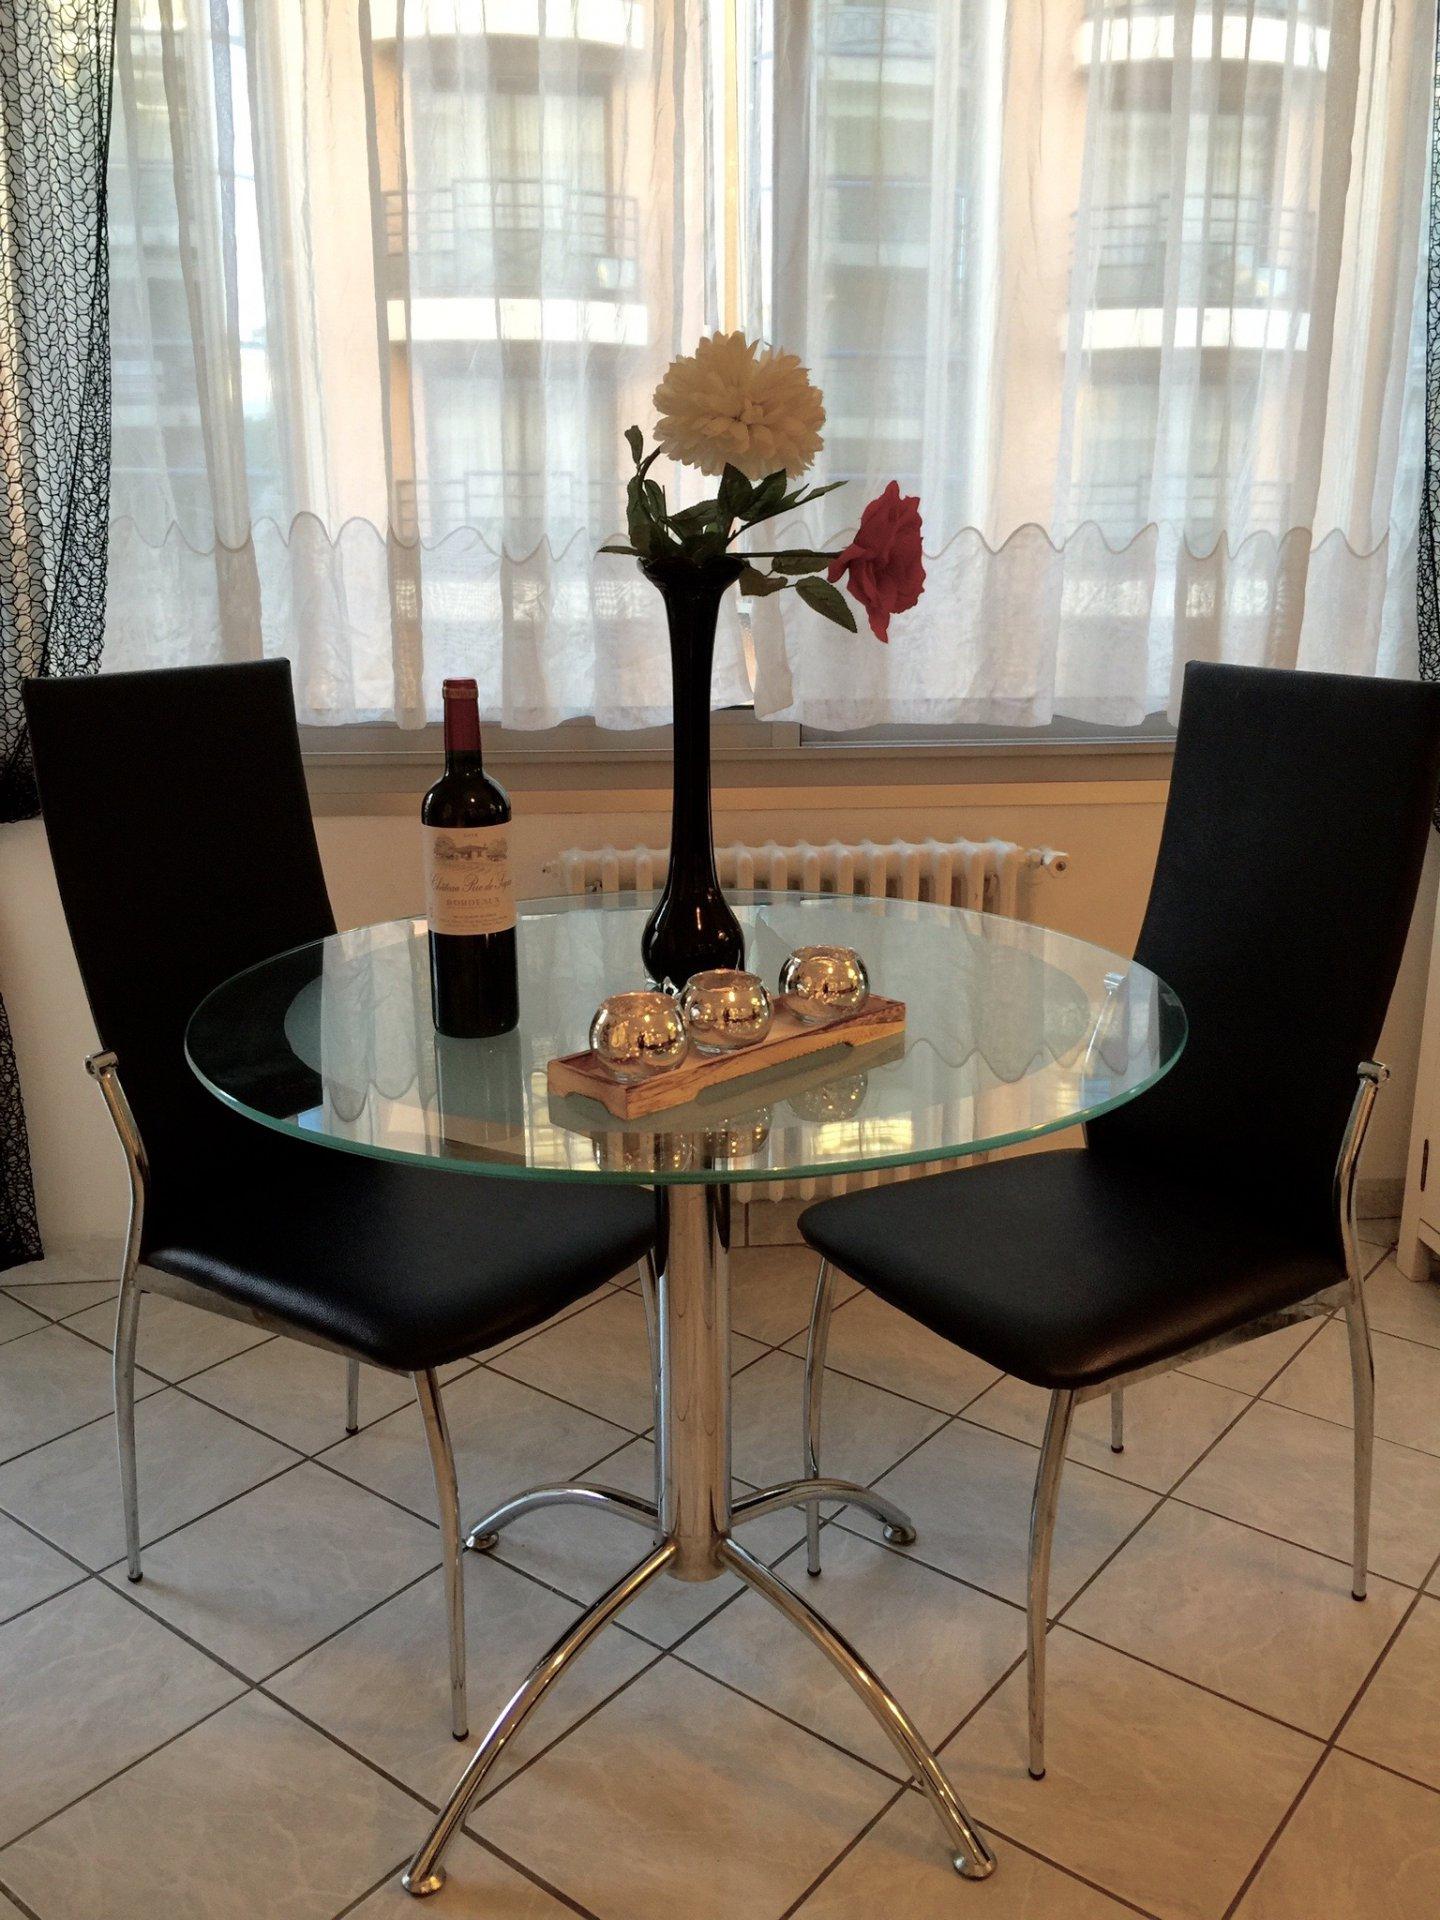 Affitto stagionale Appartamento - Cannes Banane